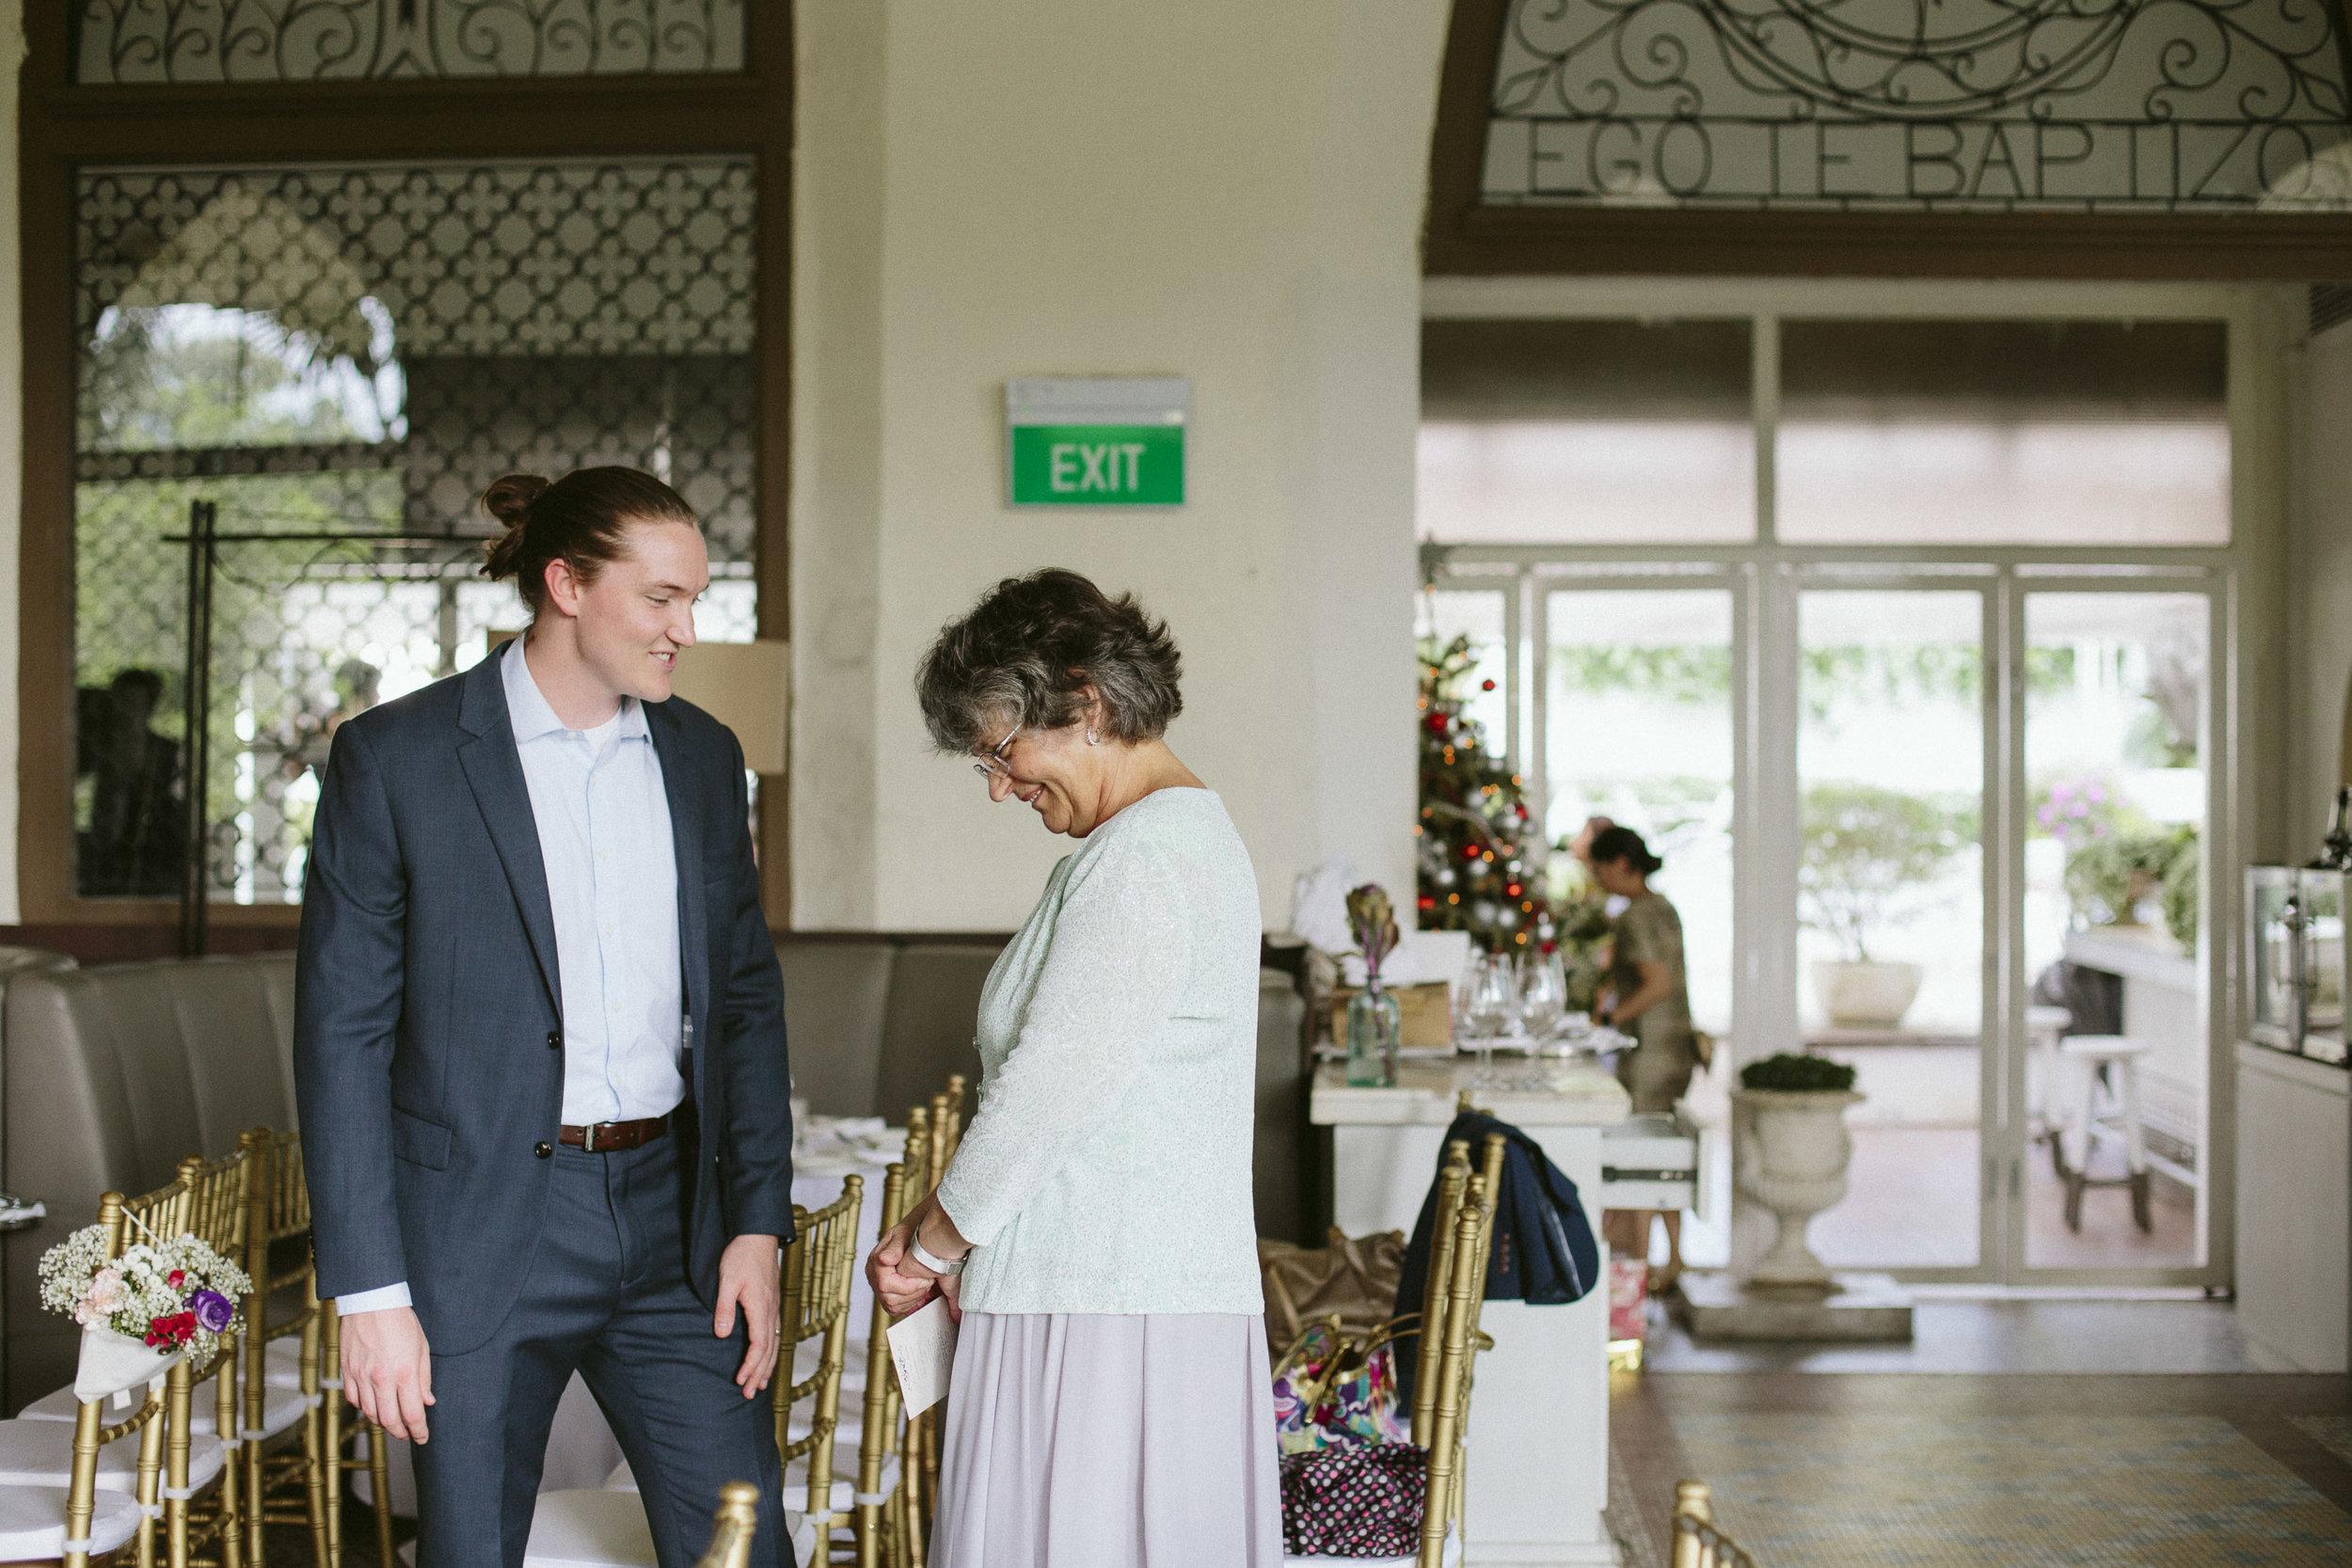 singapore-wedding-photographer-hiram-joyce-005.jpg